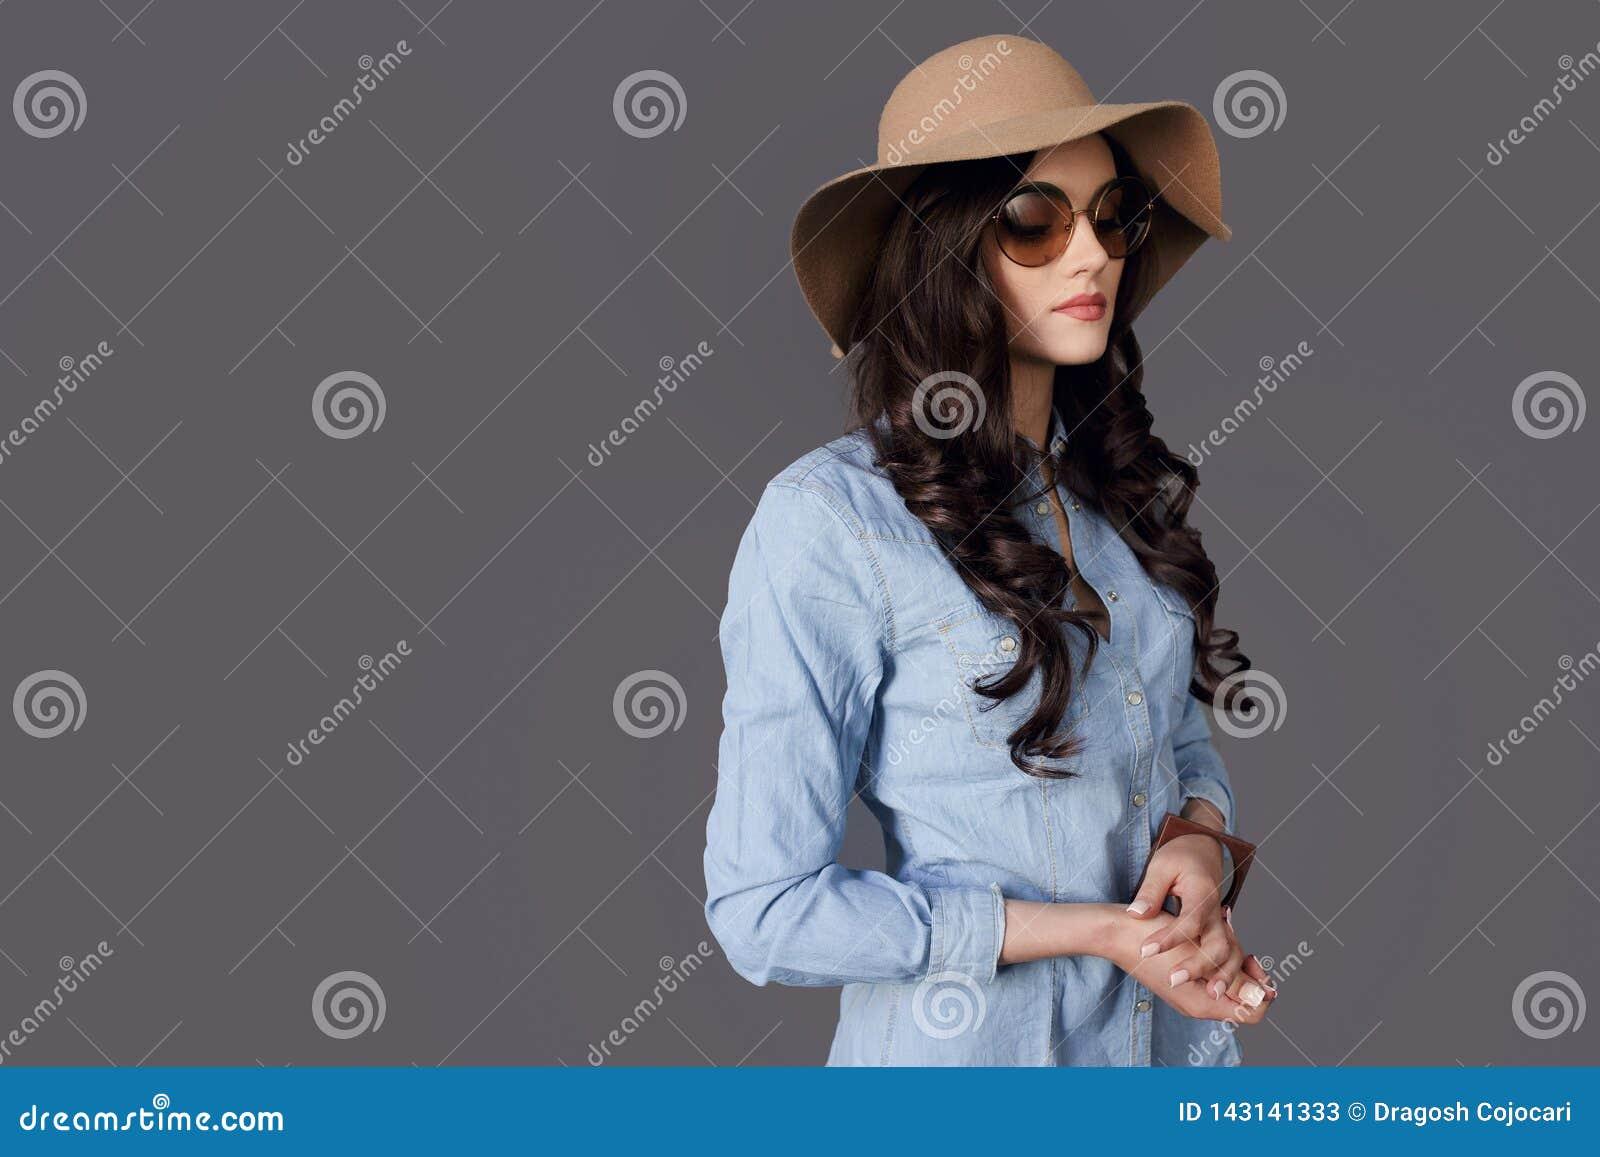 4582da0d75 Beauty Portrait Brunette Young Woman Posing In Profile